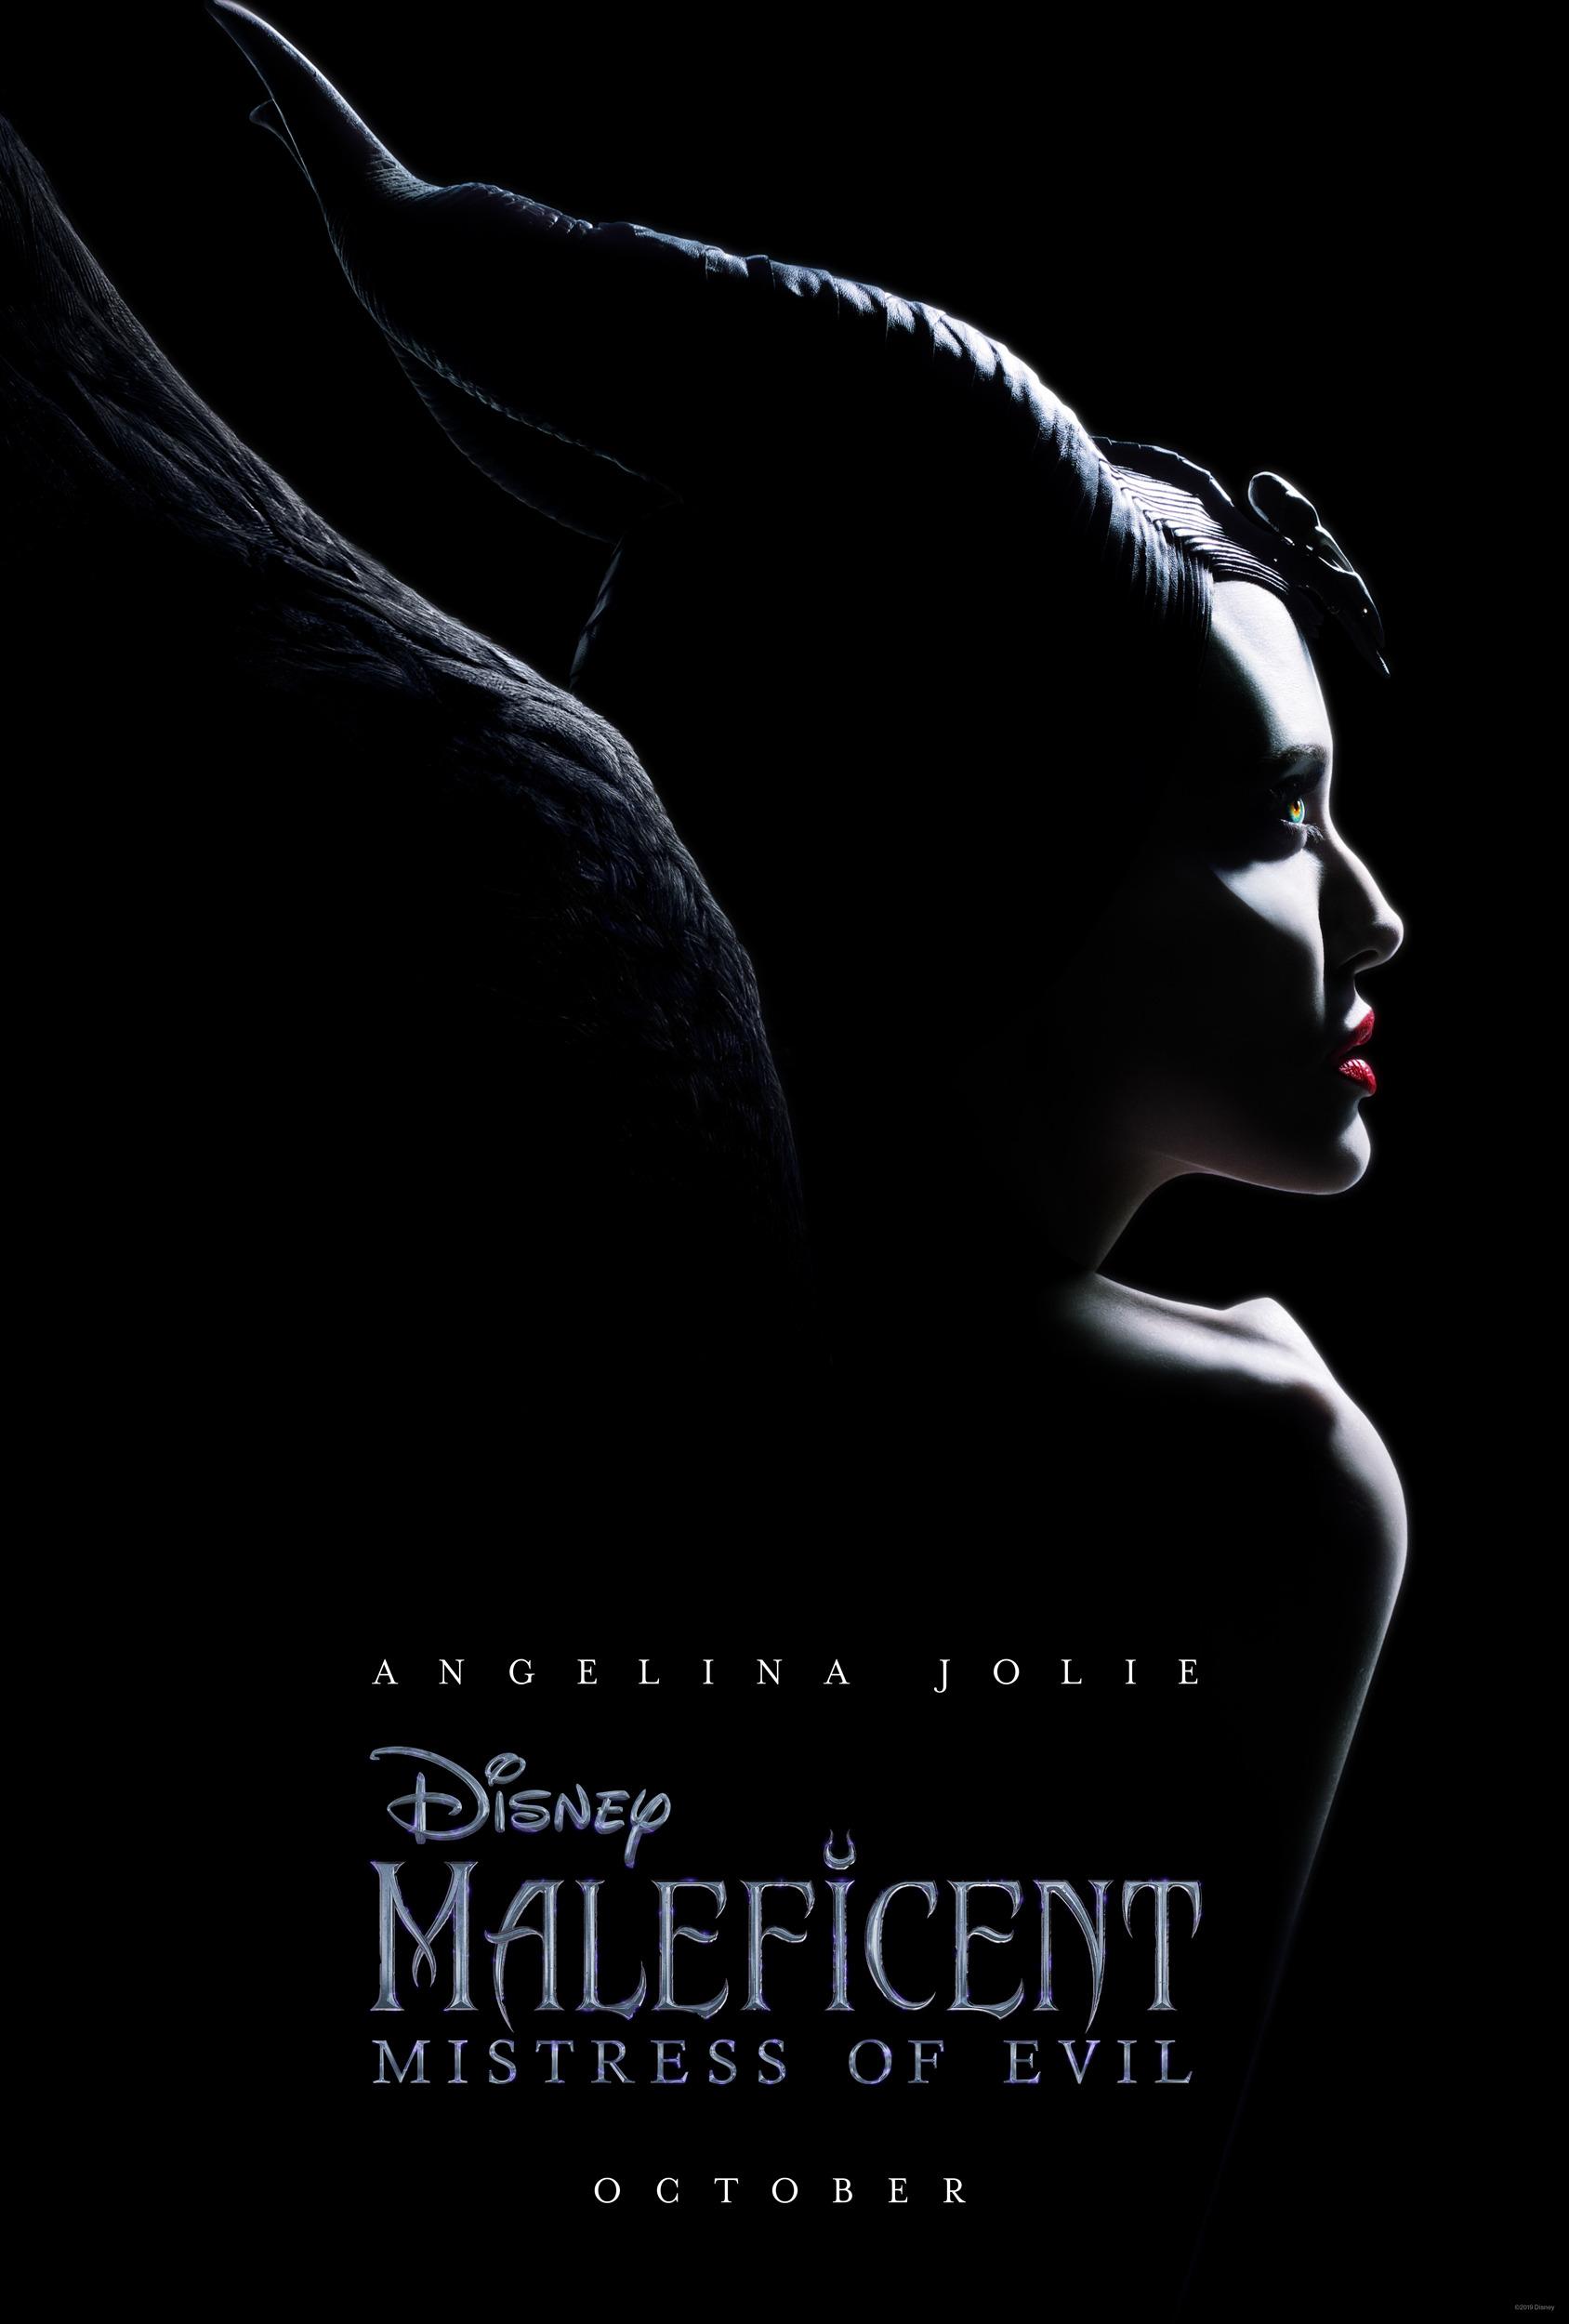 szmk_maleficent_mistress_of_evil_demona_disney_csipkerozsika_angelina_jolie_sotetseg_urnoje_2_8.jpg